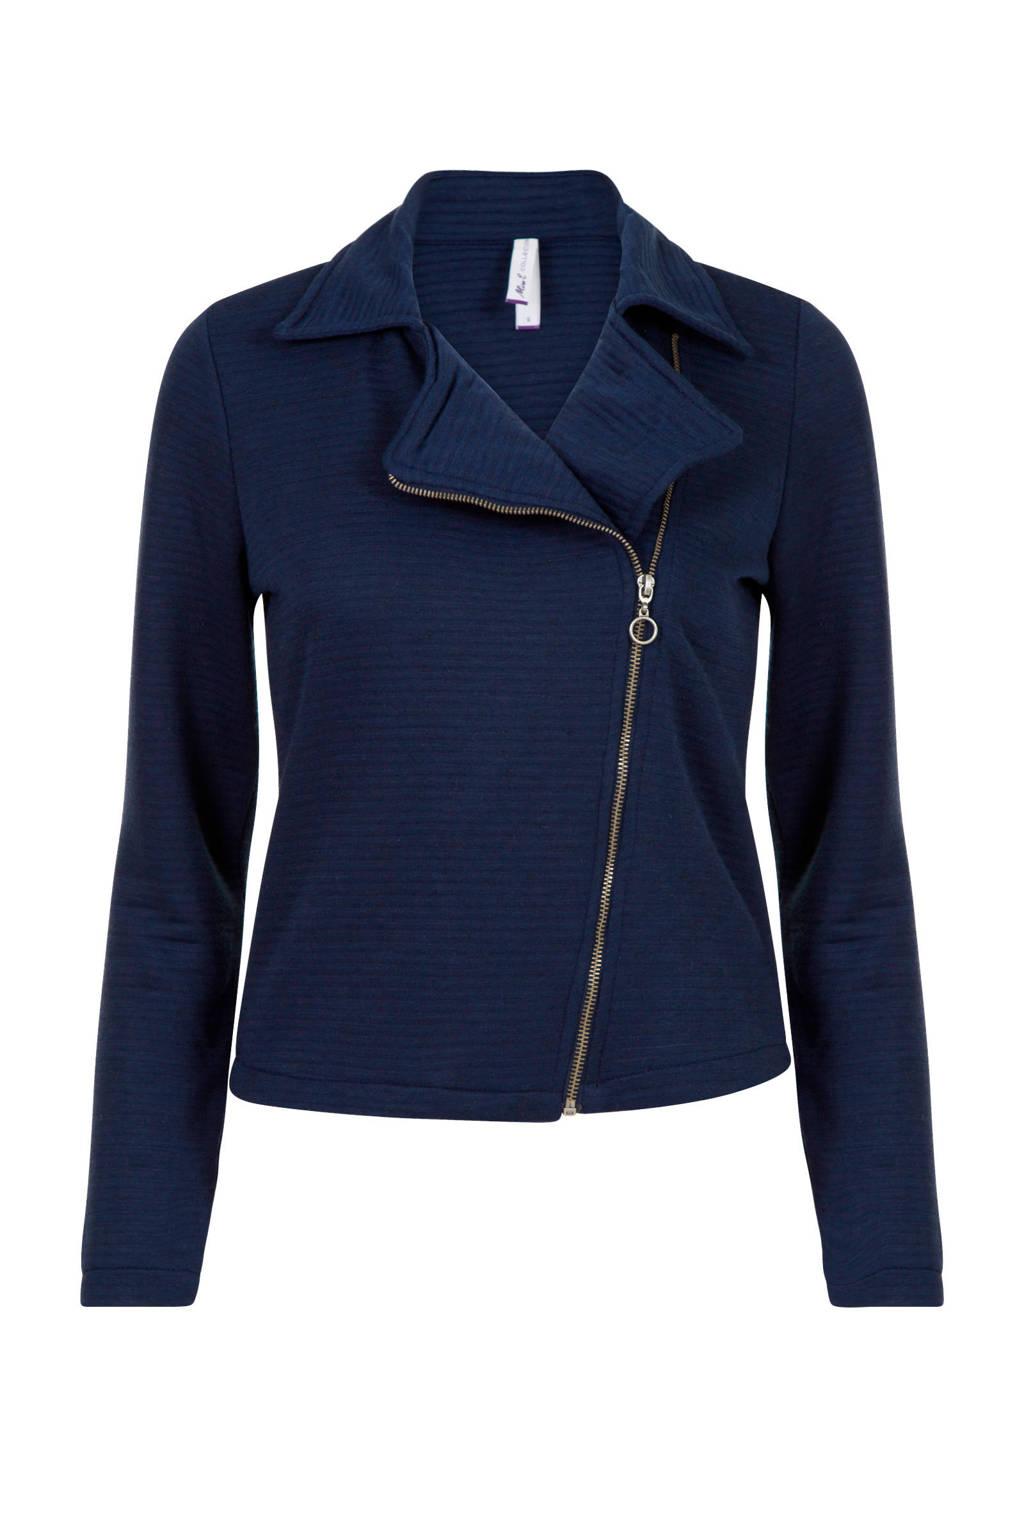 Miss Etam Regulier vest blauw, Blauw